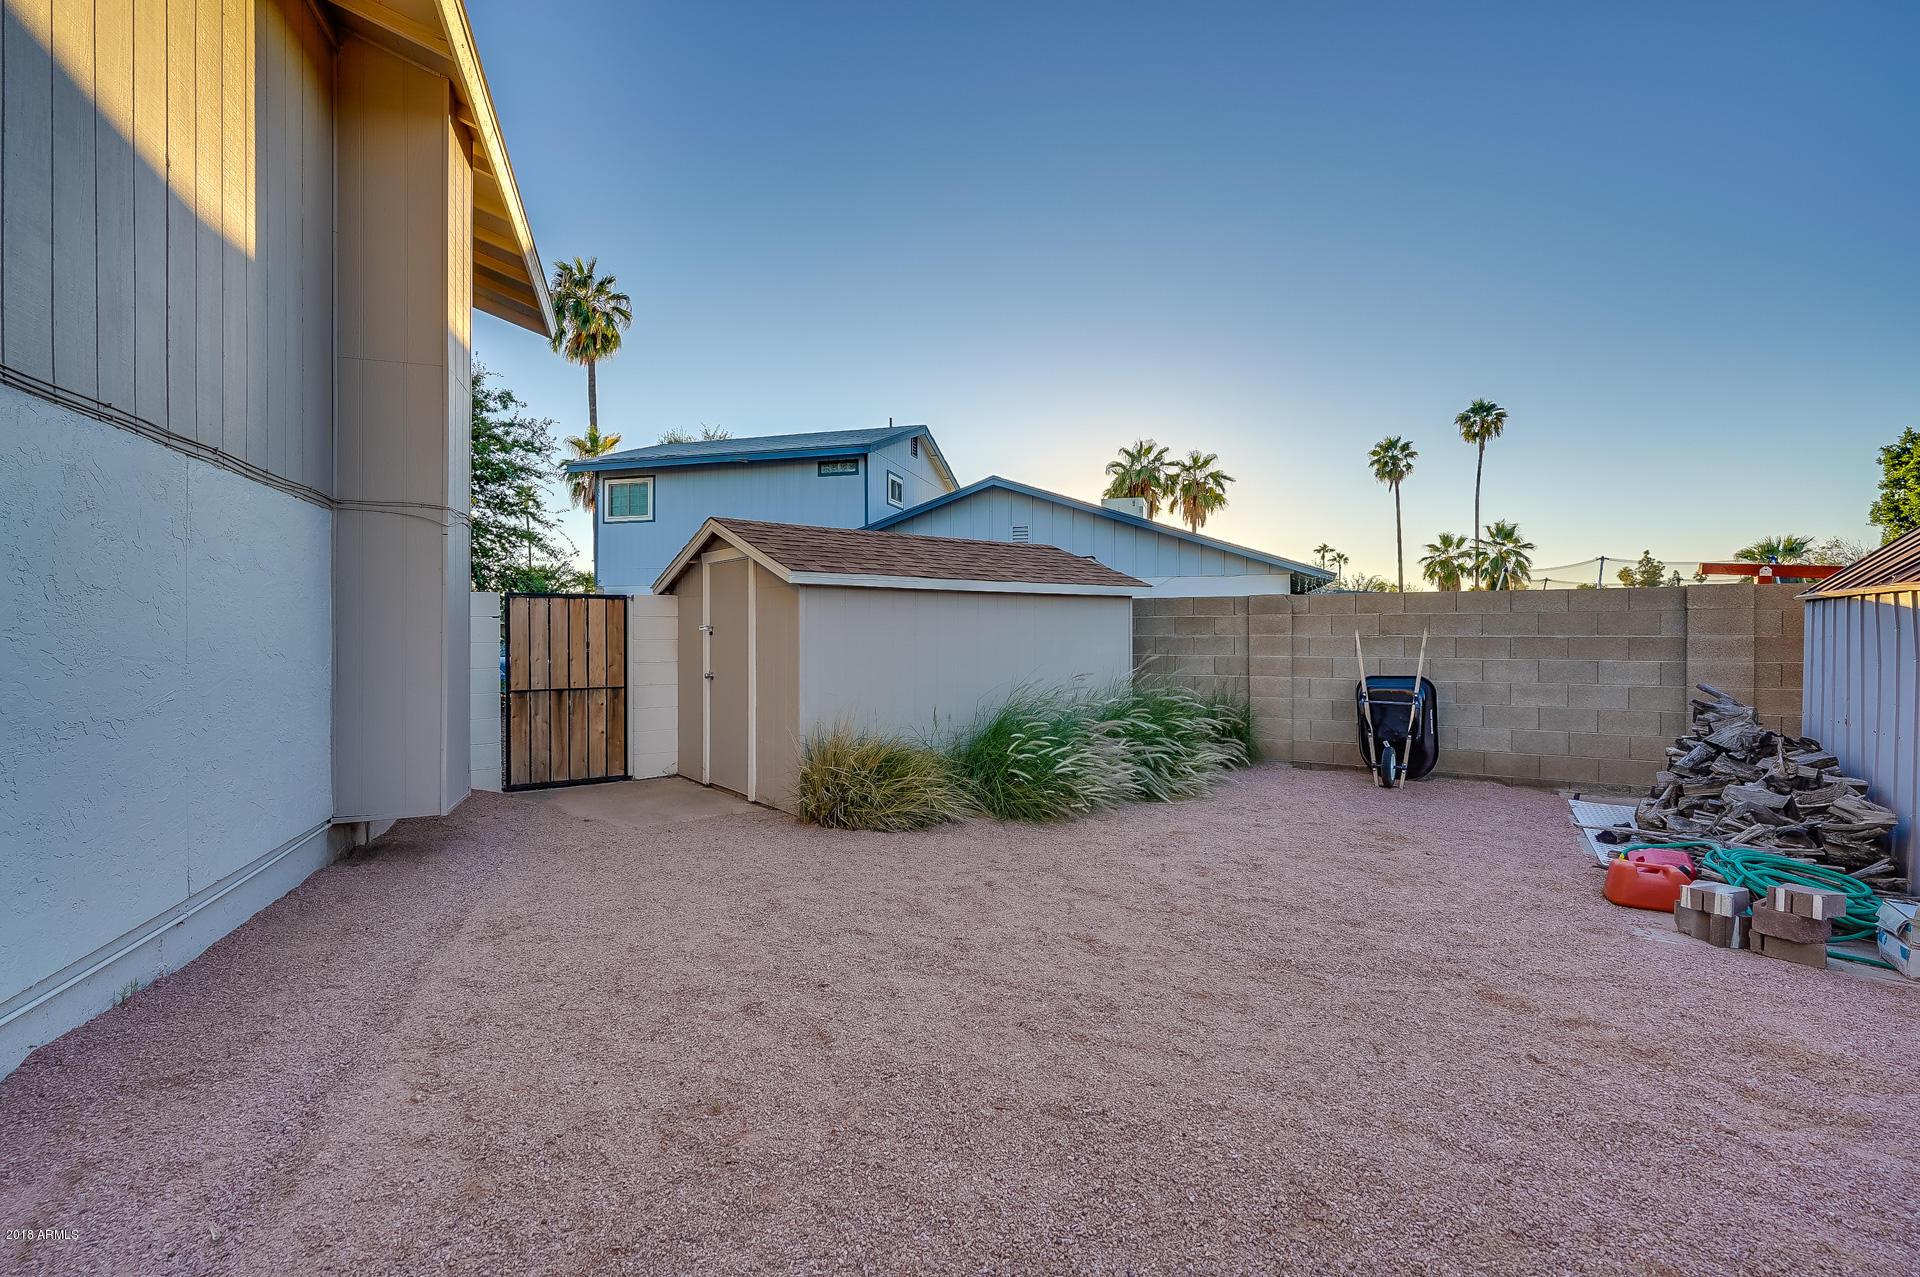 MLS 5841542 6745 S Oak Street, Tempe, AZ 85283 Tempe AZ Tempe Gardens